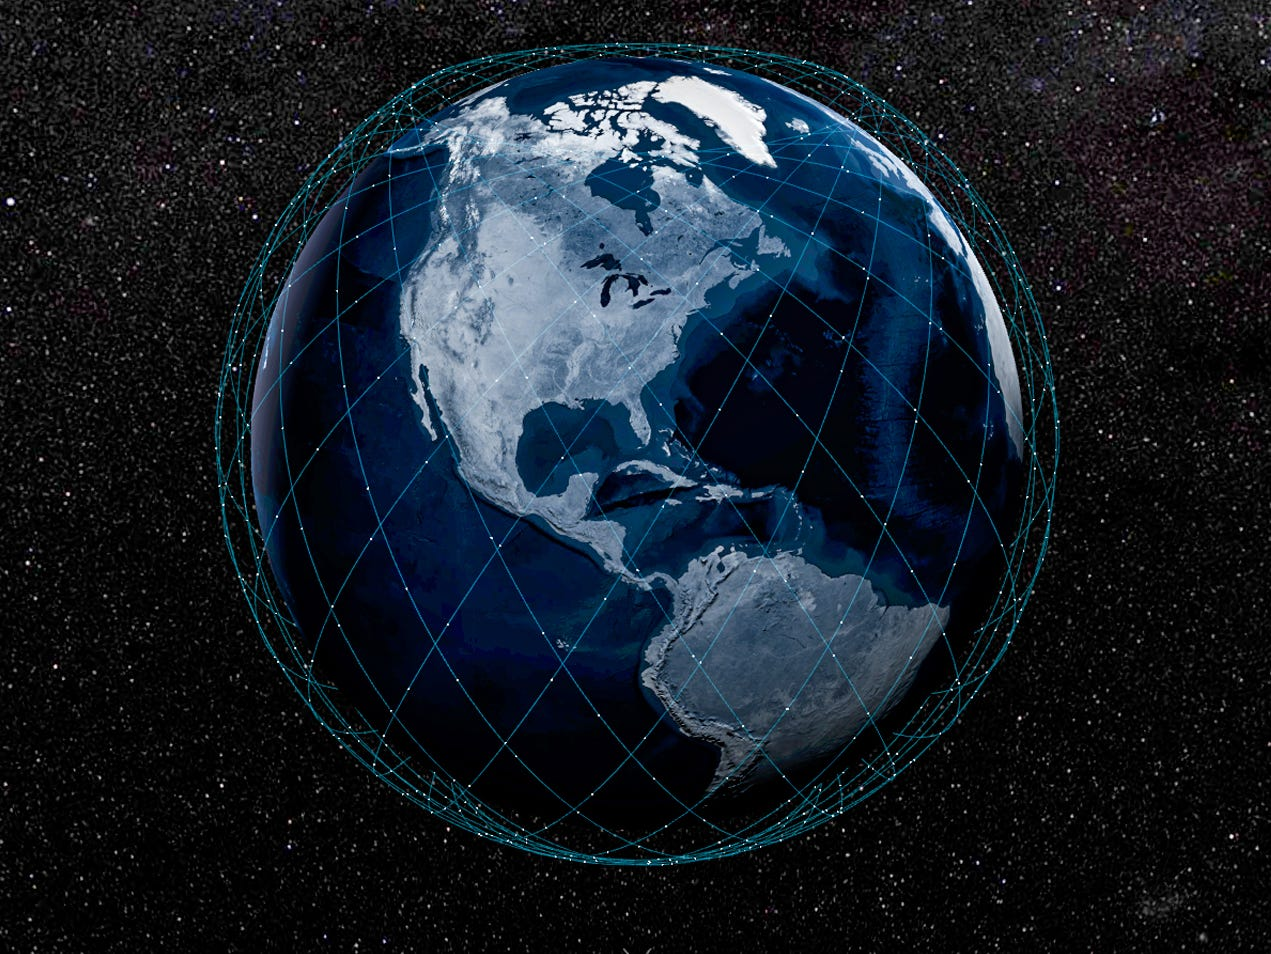 Terra revolta por satélites starlink